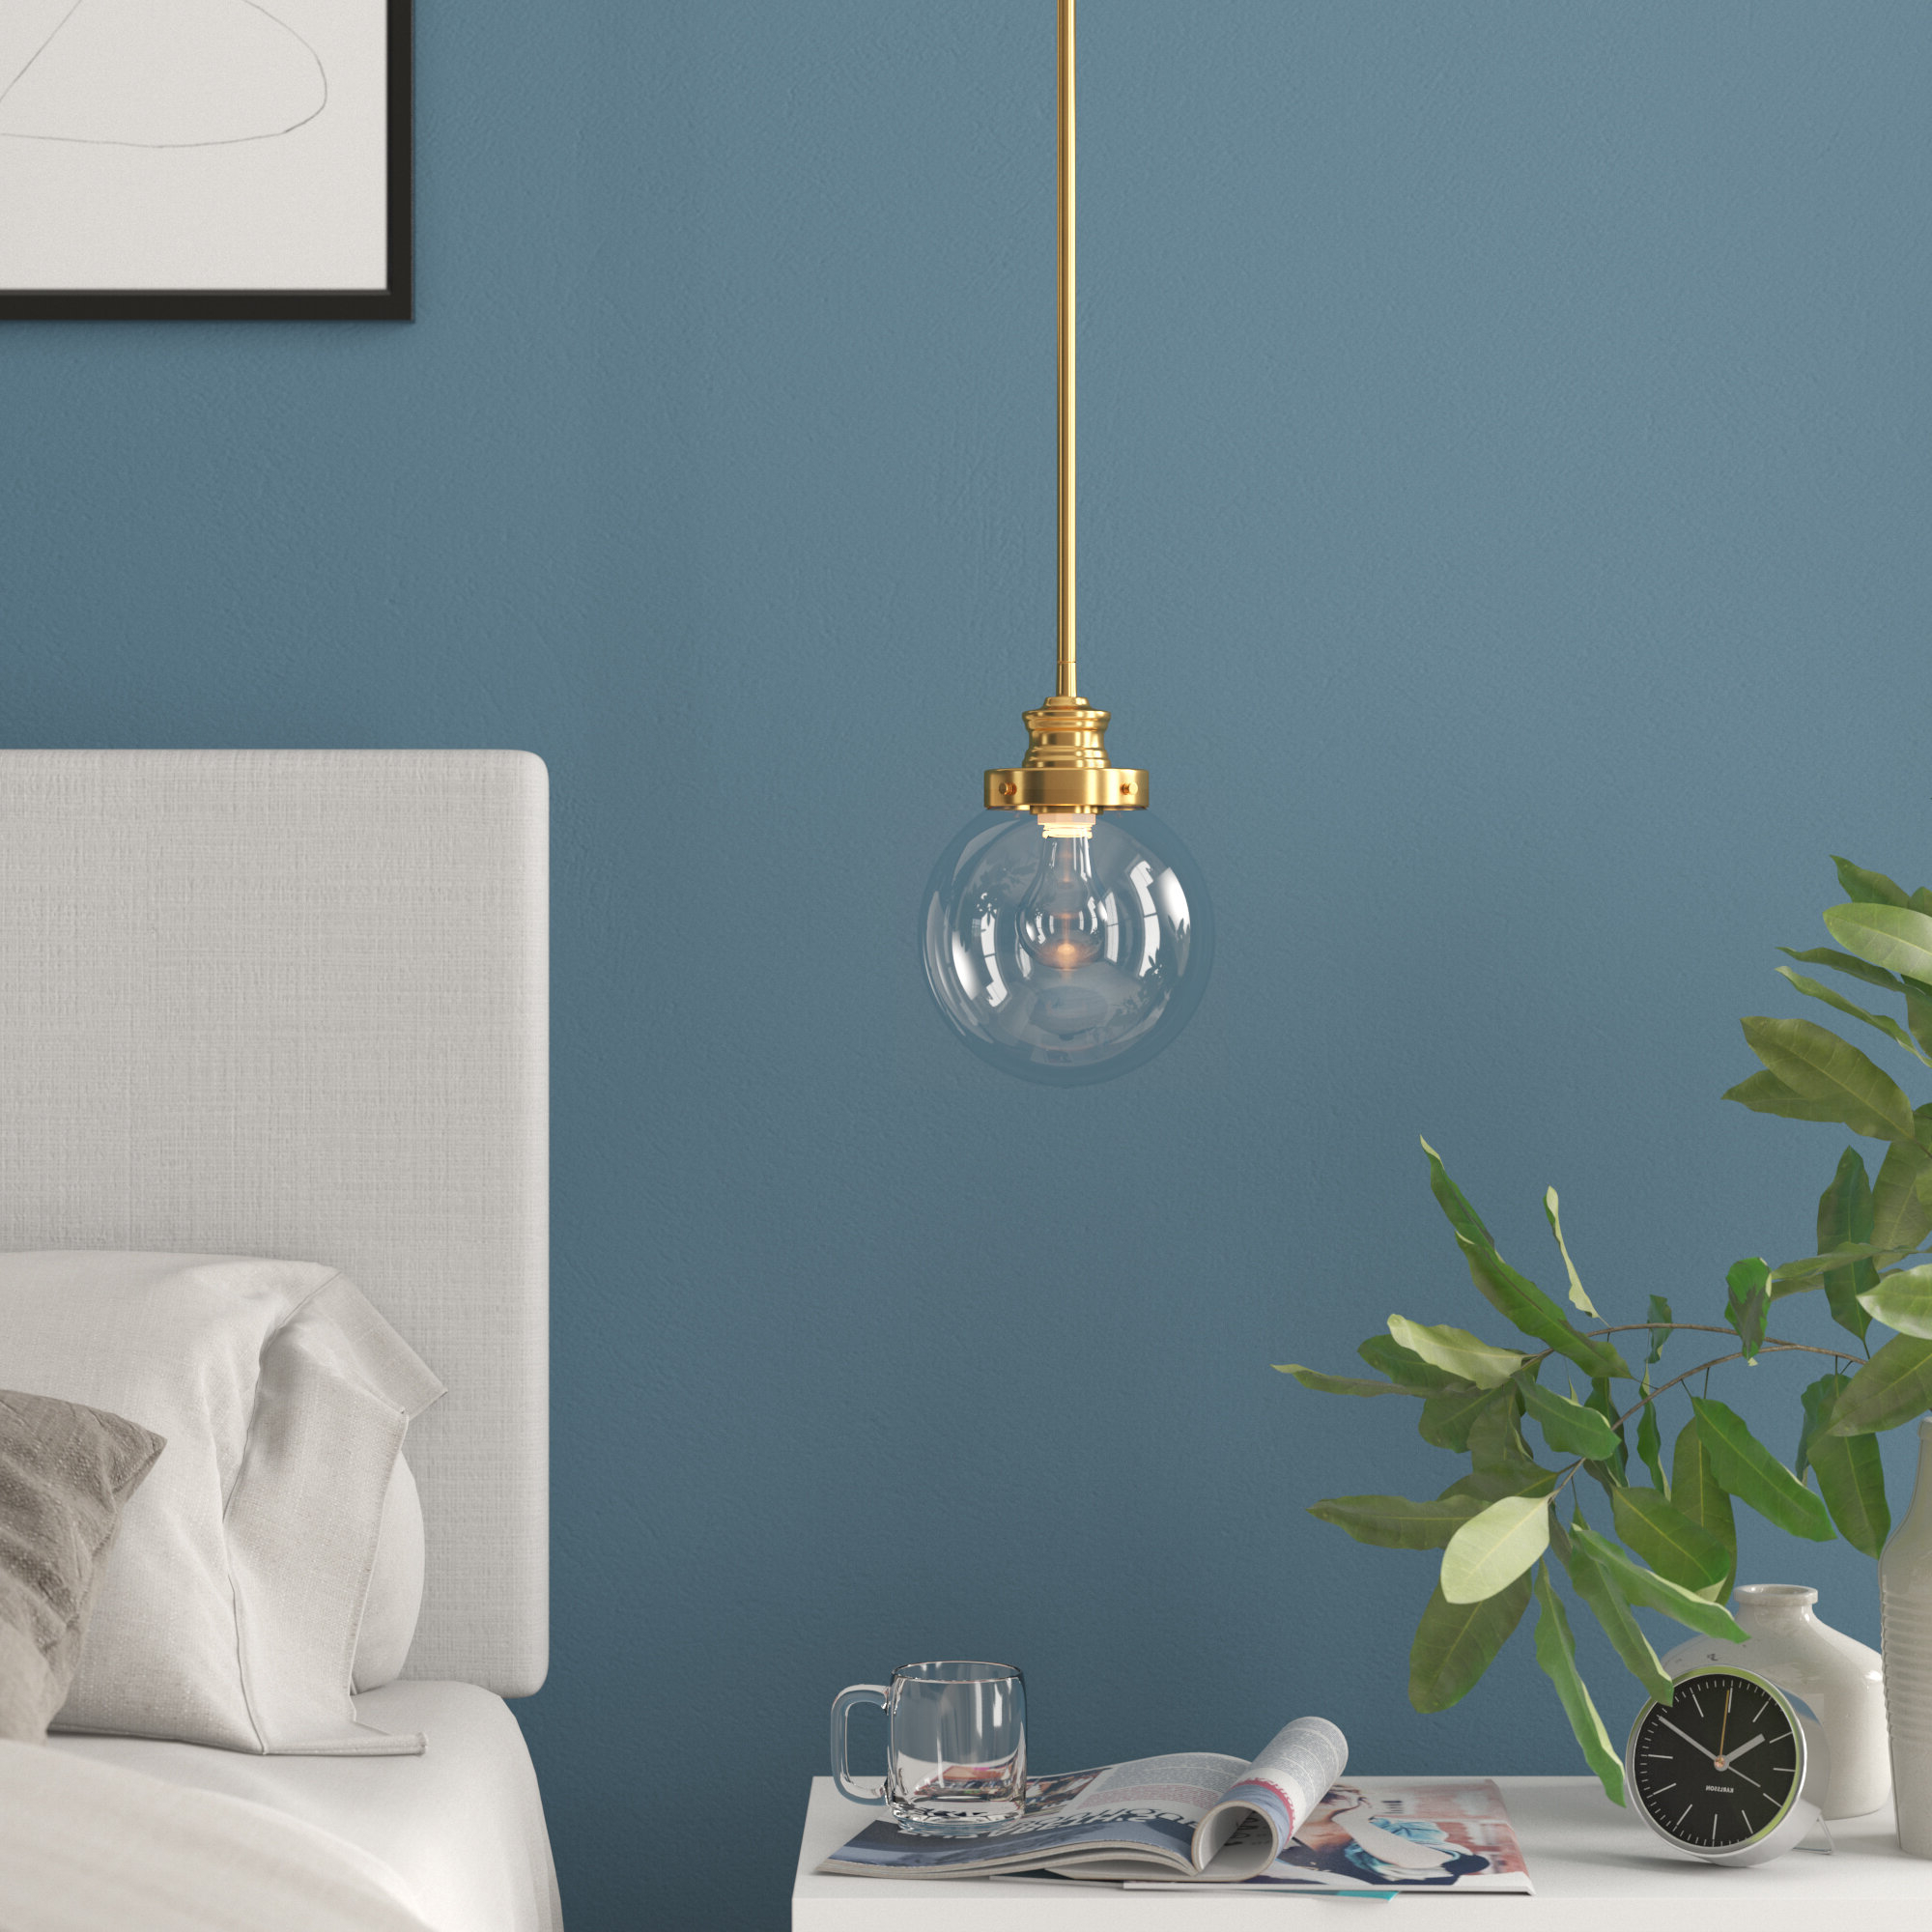 Cayden 1 Light Single Globe Pendants For Most Popular Cayden 1 Light Single Globe Pendant (View 9 of 25)